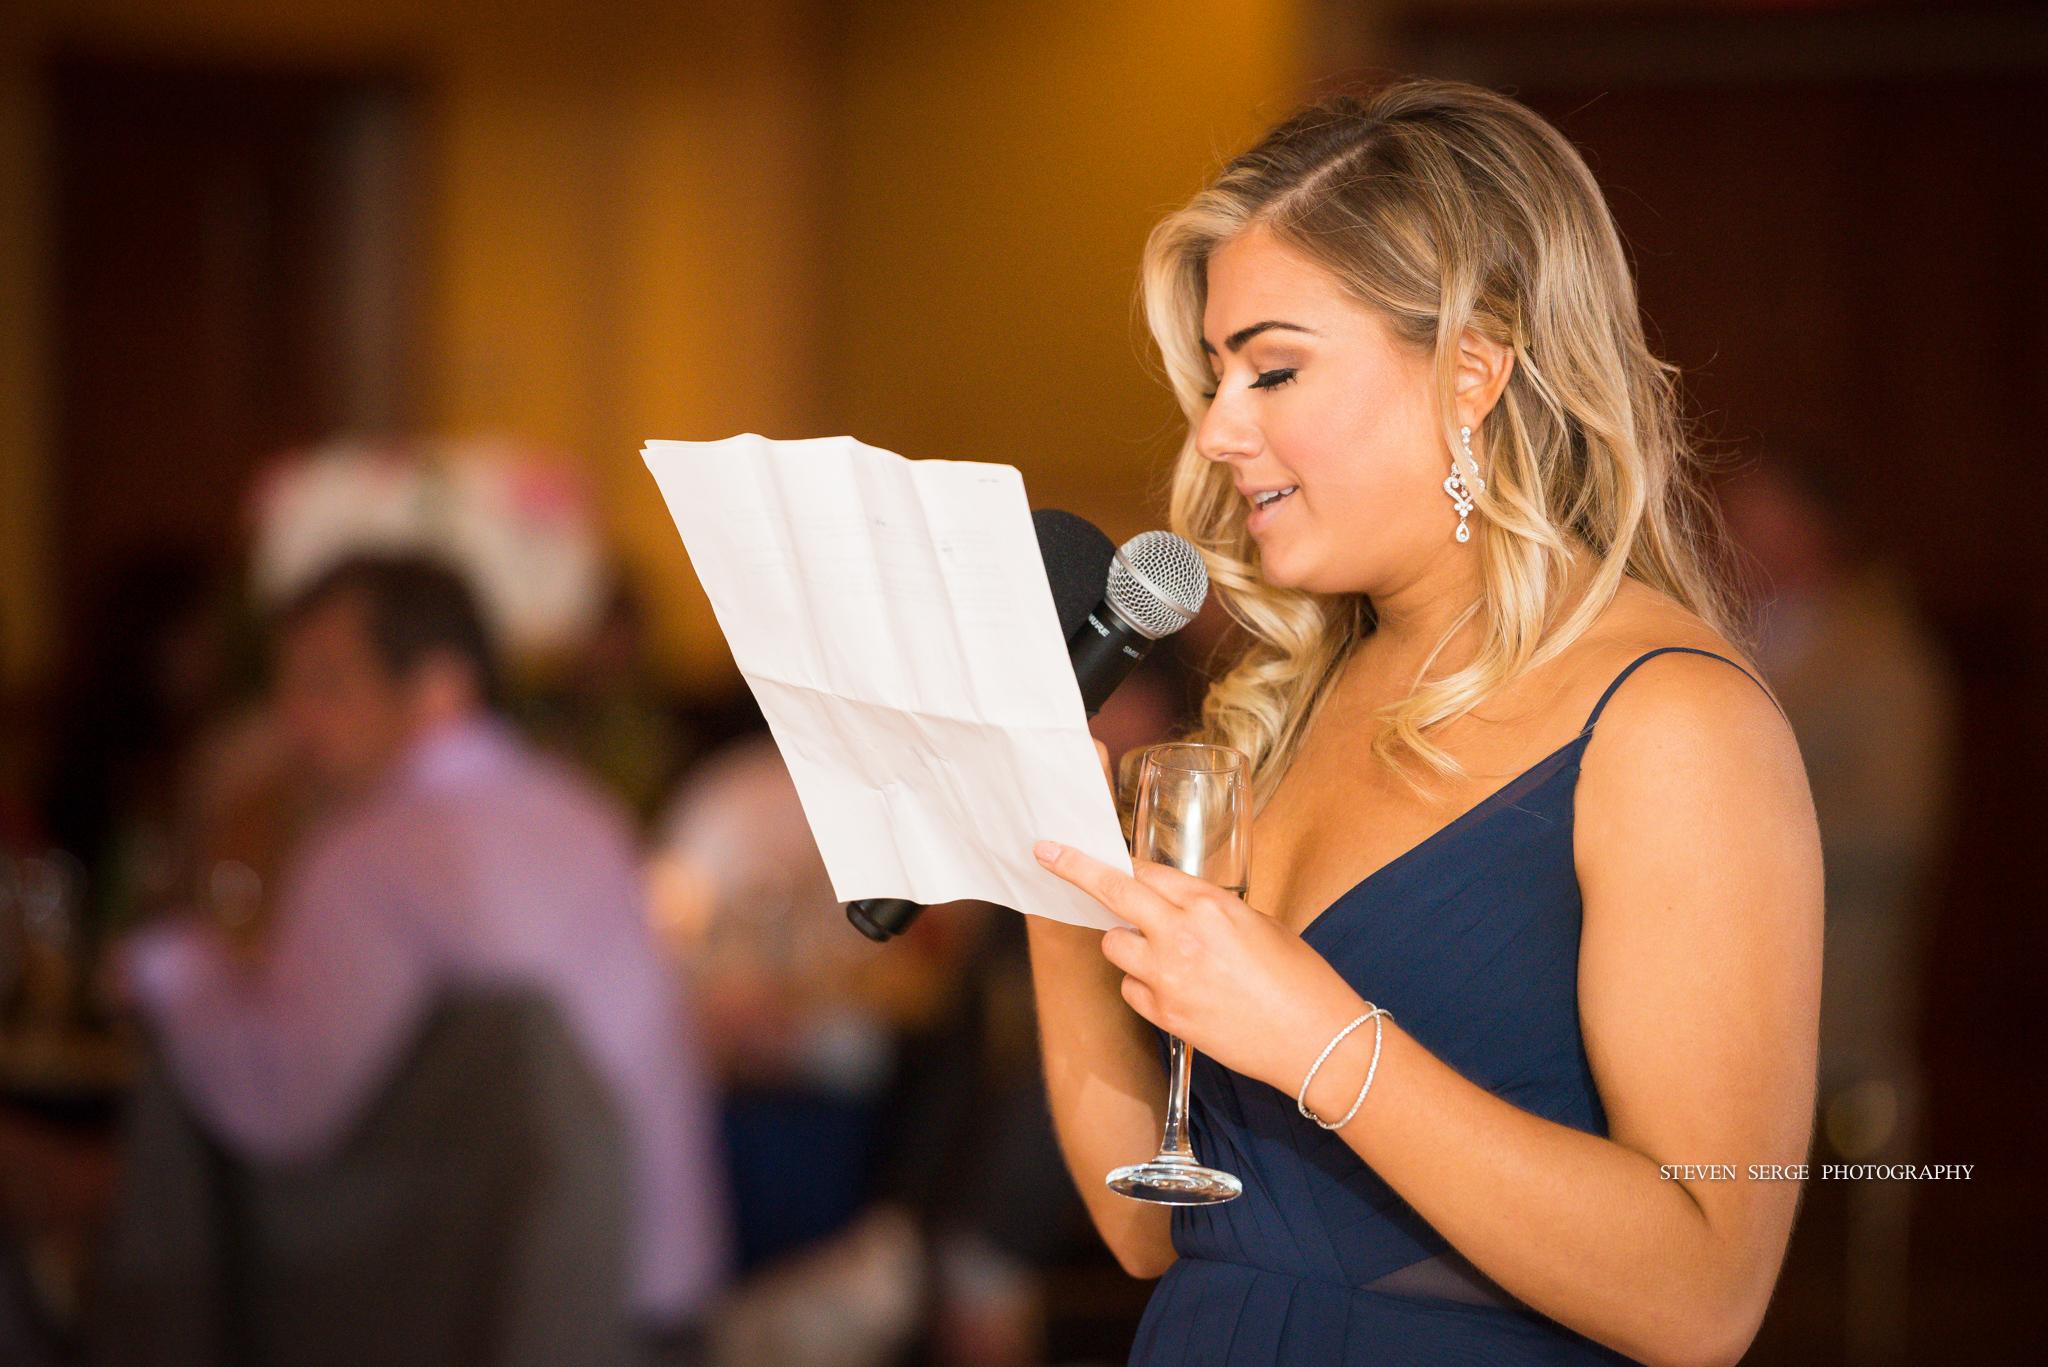 scranton-wedding-photographers-hilton-steven-serge-photography-18.jpg